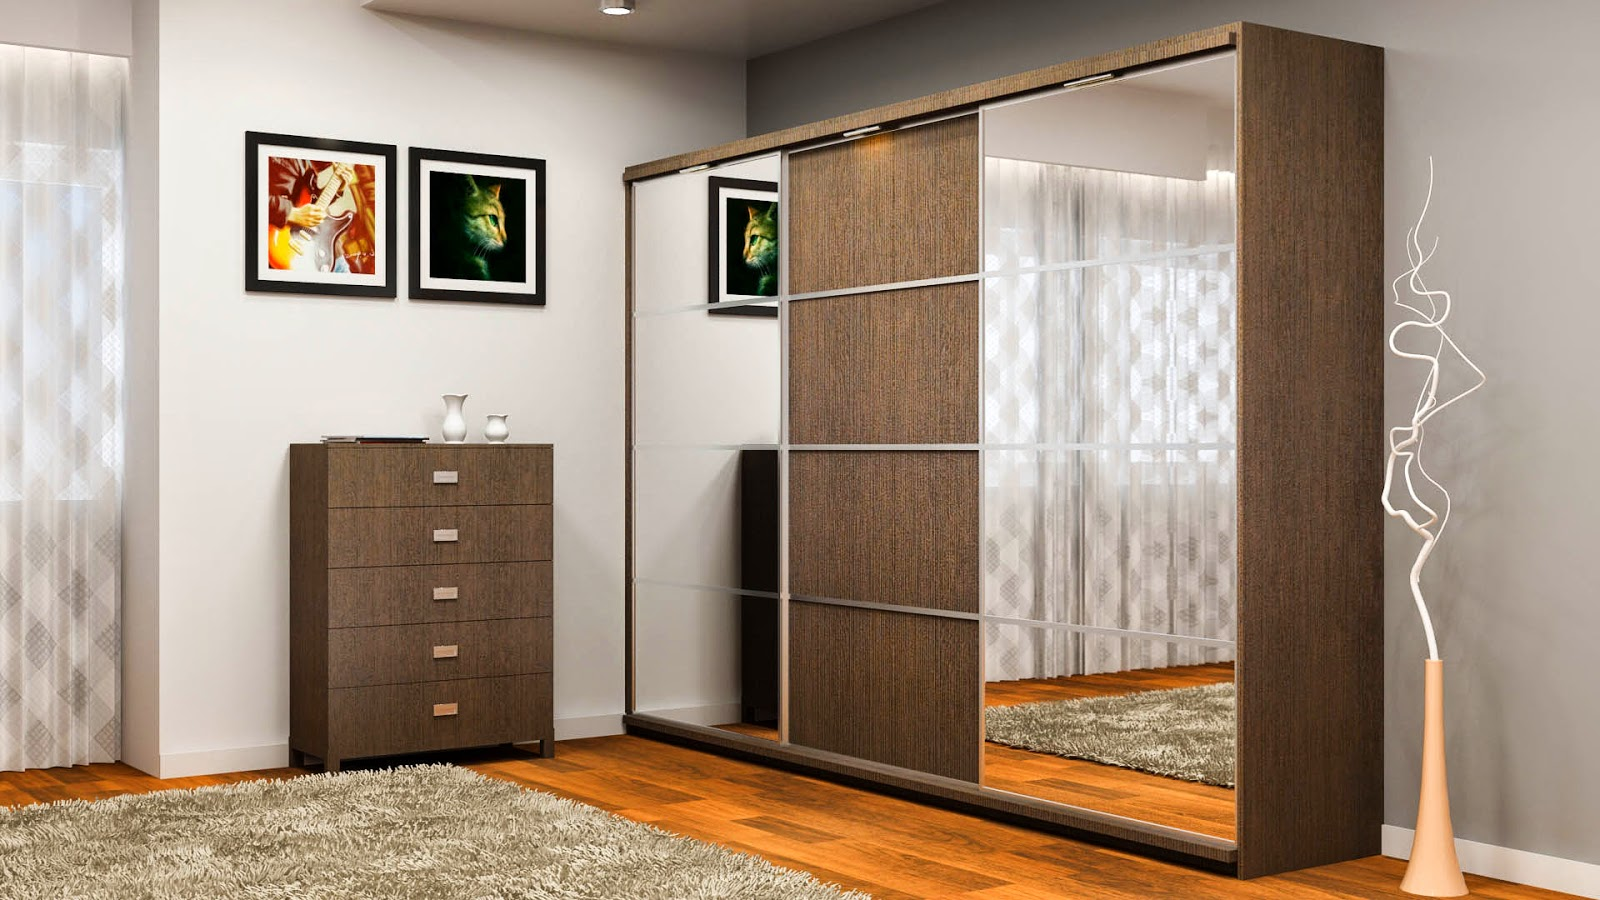 Bedroom Wardrobes   Interior Decor Blog - Customfurnish.com